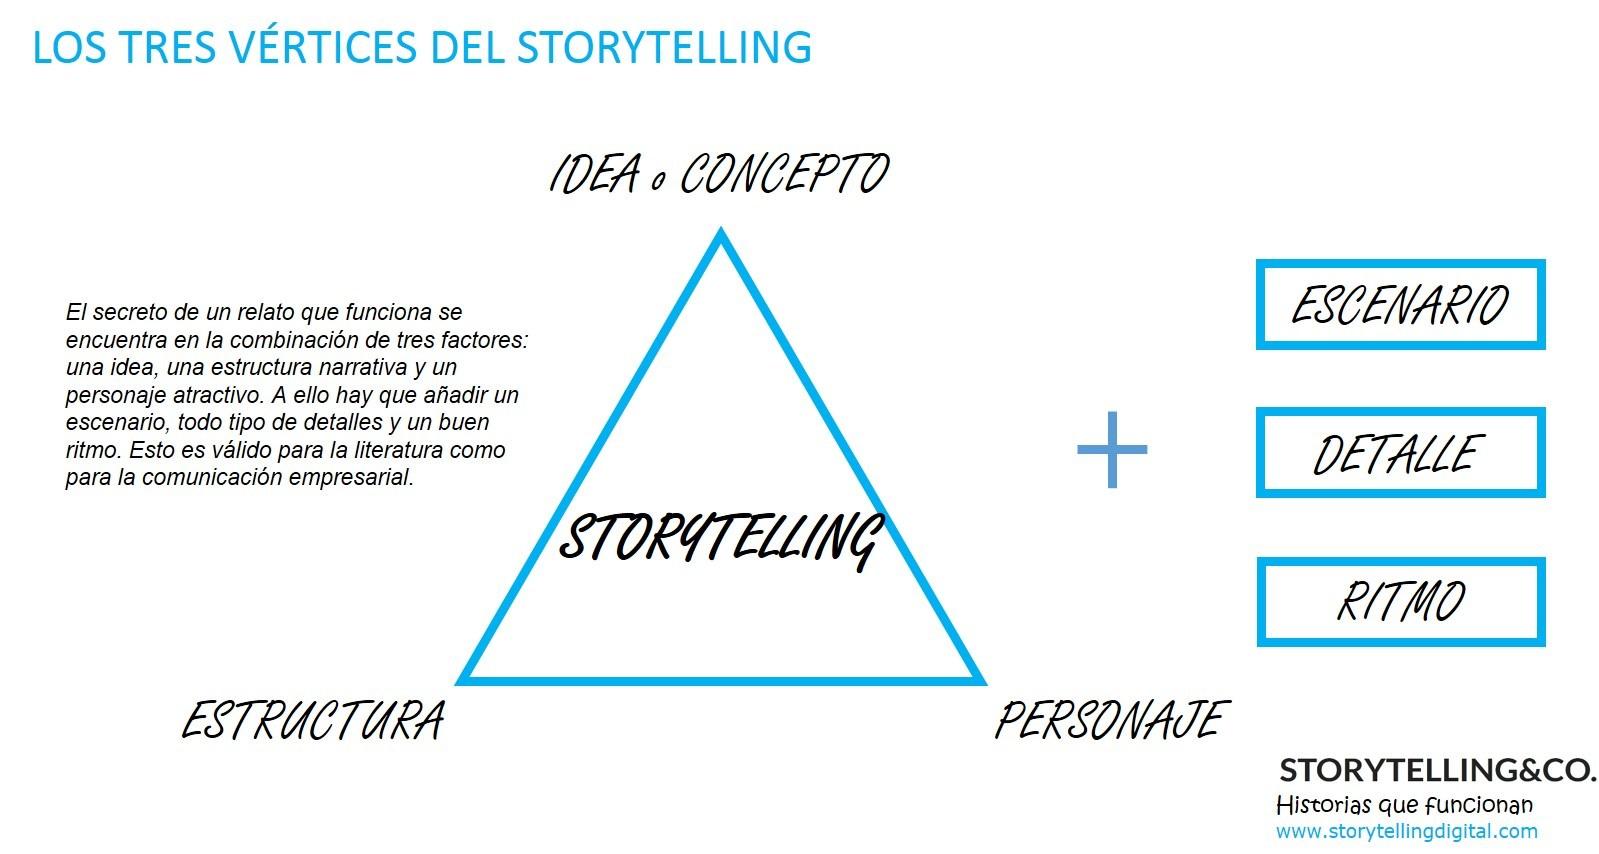 vértices del storytelling corporativo